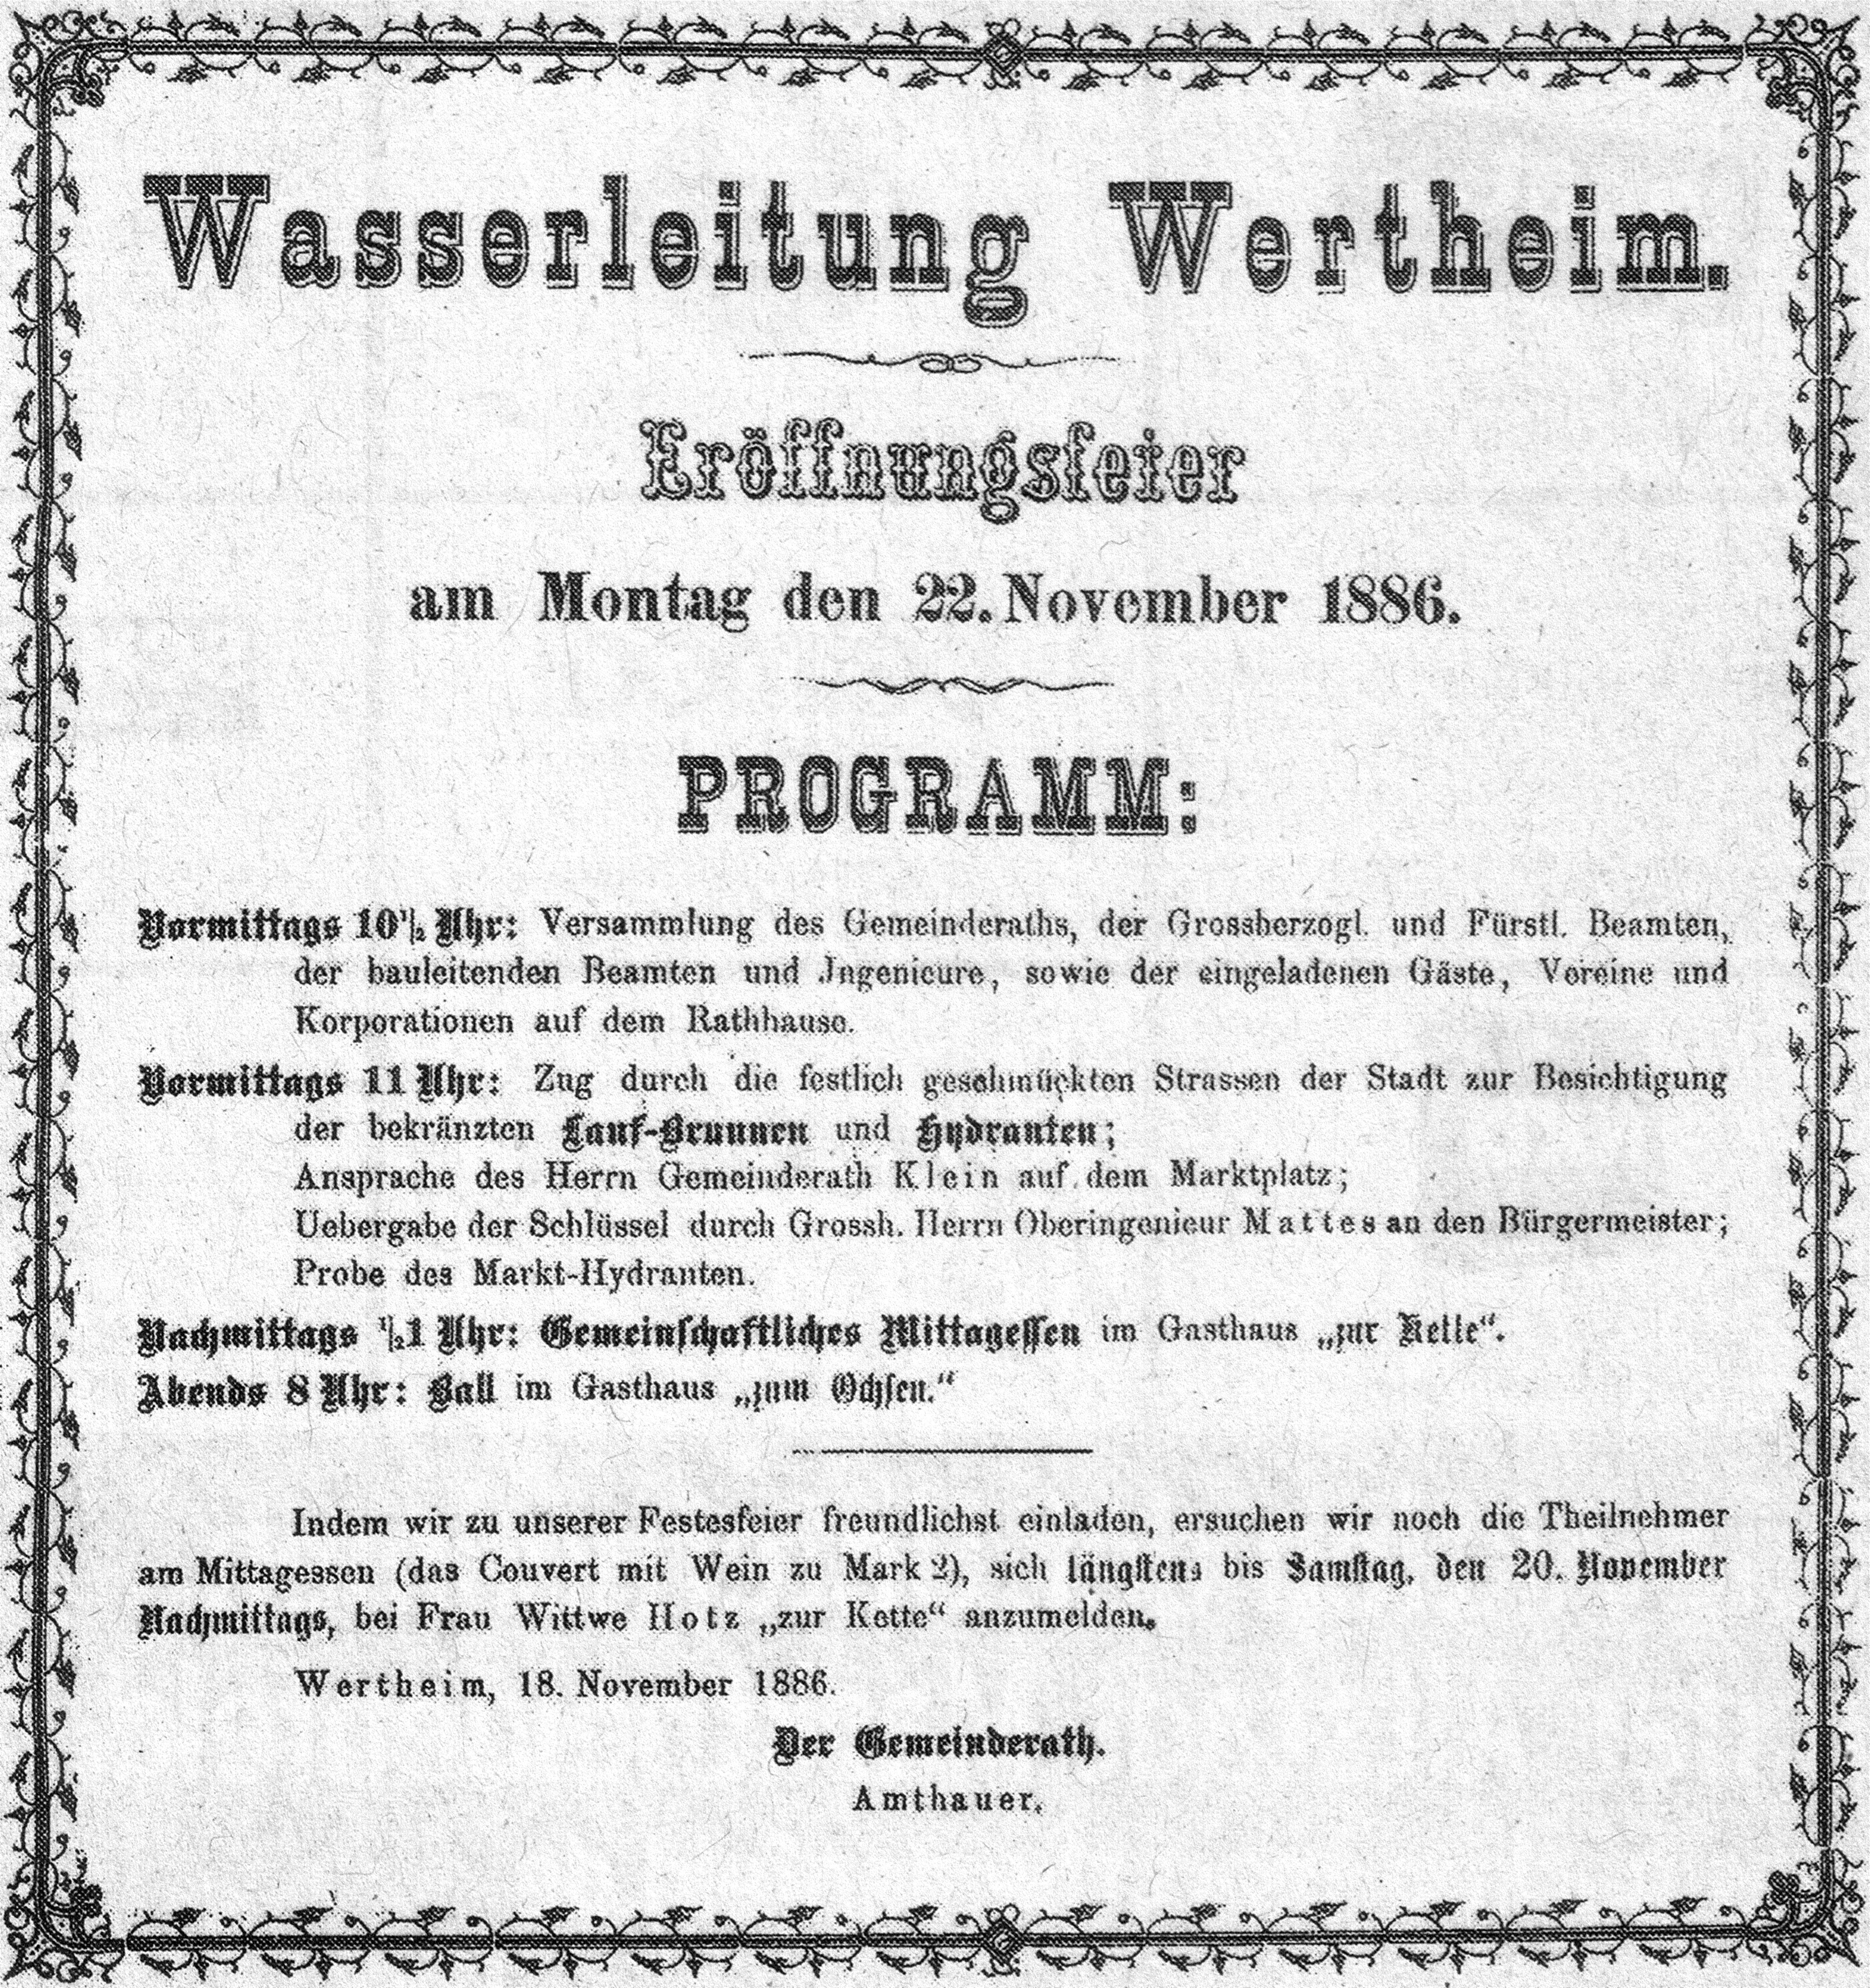 File Aushang Wasserleitung Wertheim 1886 Jpg Wikimedia Commons